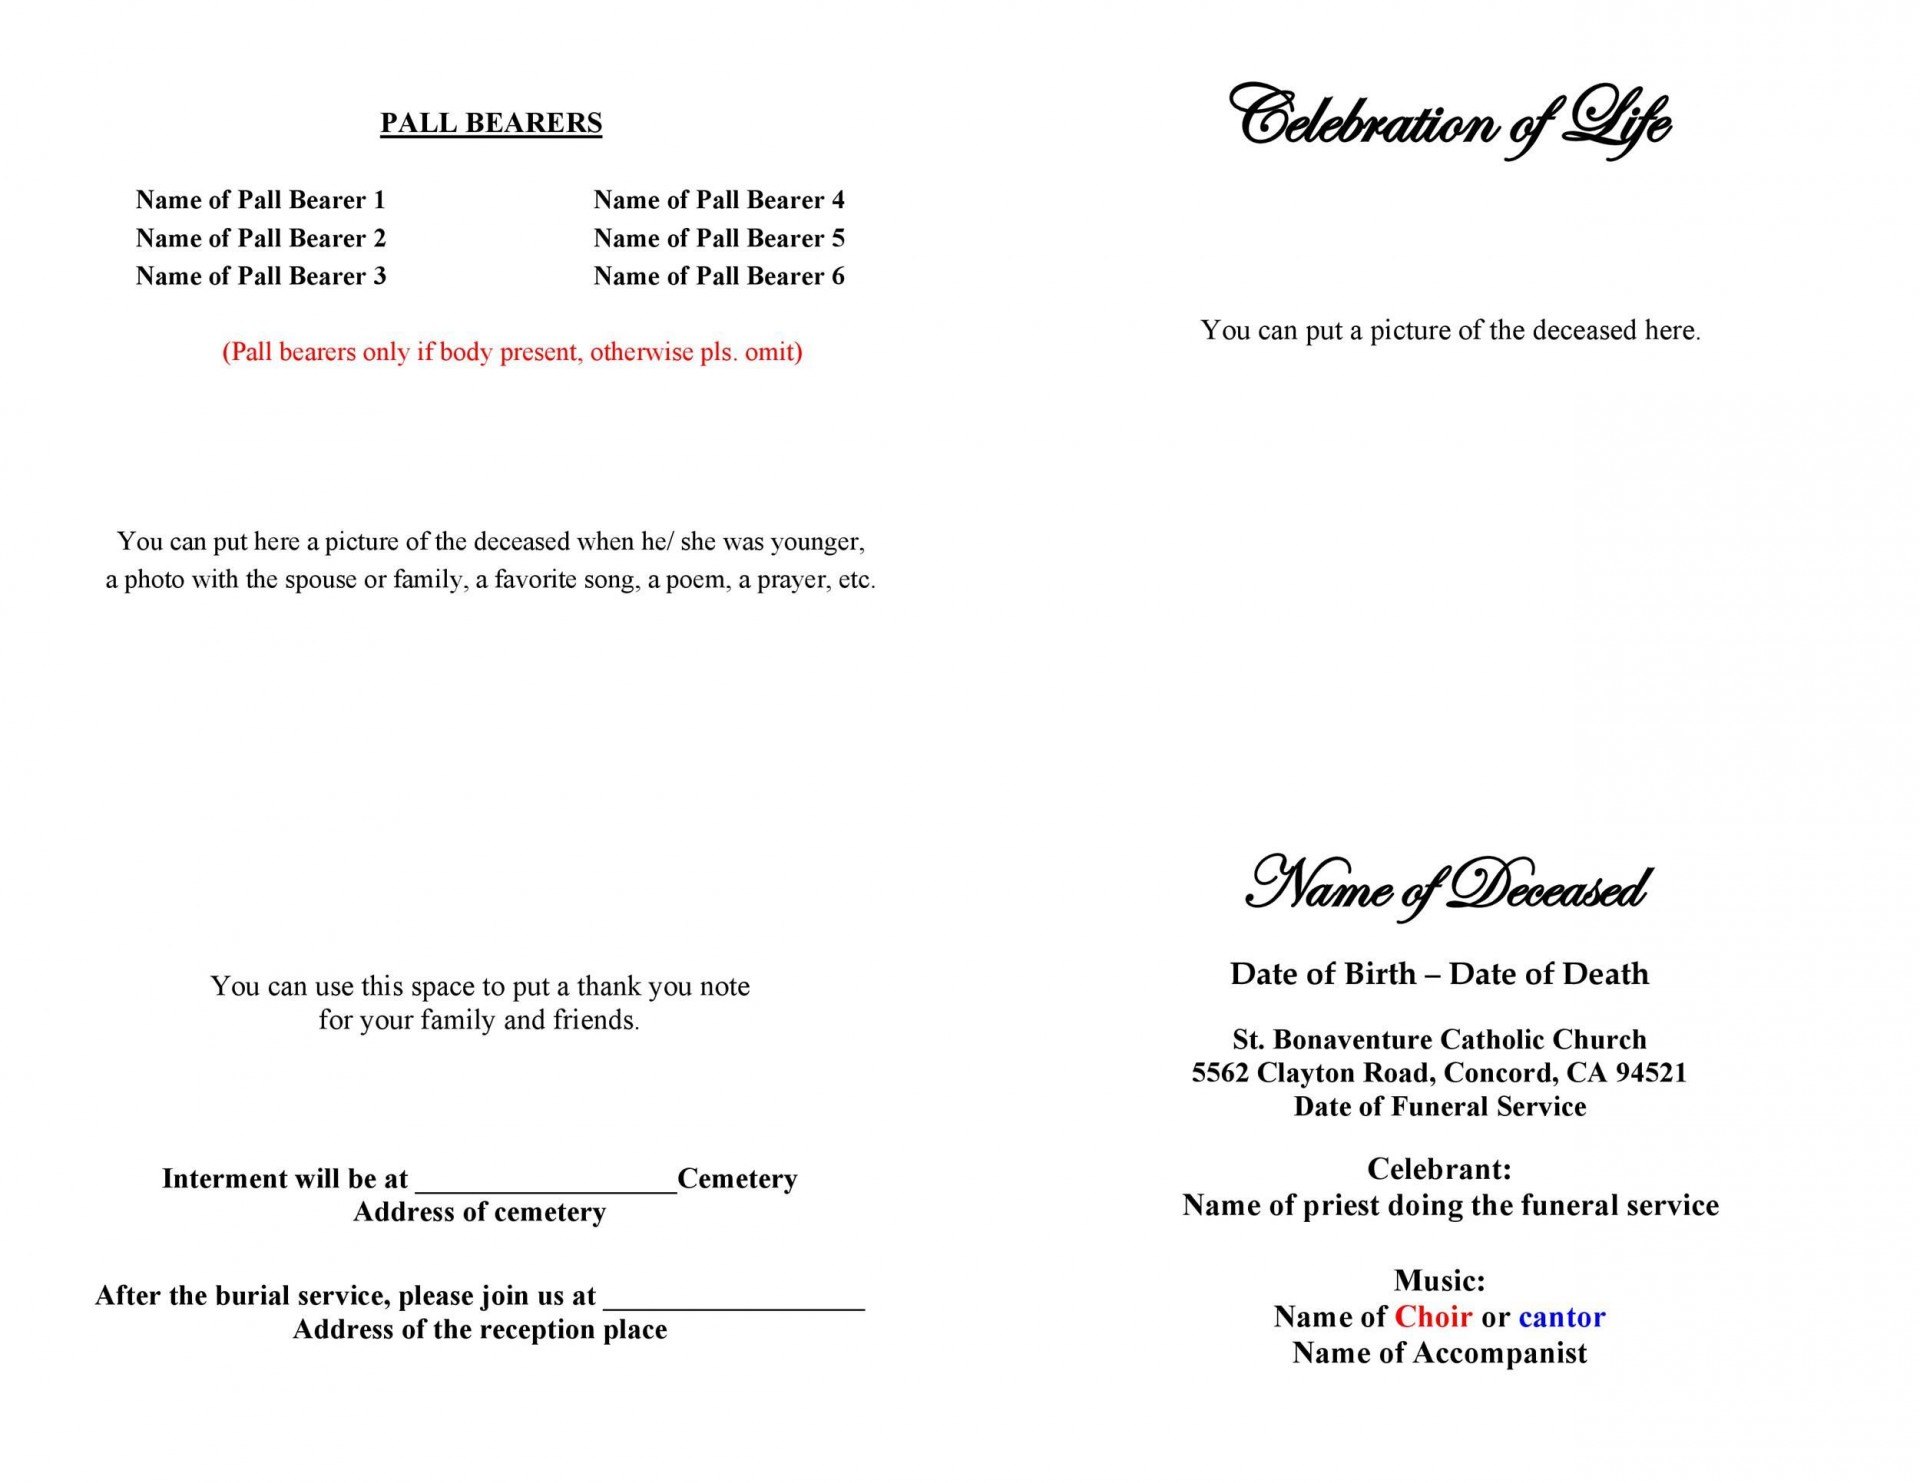 007 Rare Celebration Of Life Program Template Free Image  Editable Word1920